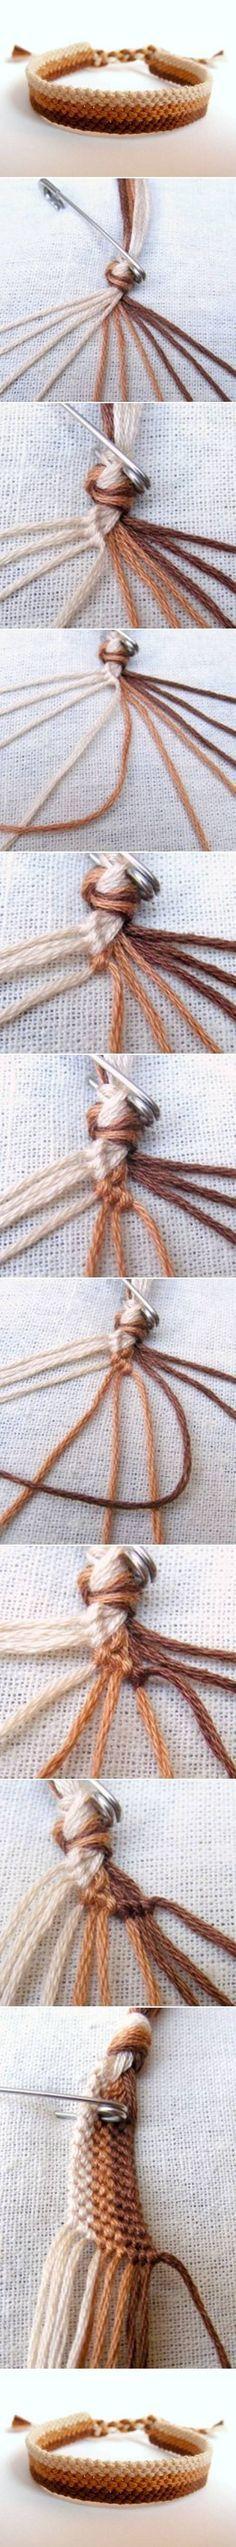 DIY Weave Braclet diy crafts craft ideas easy crafts diy ideas crafty easy diy diy jewelry diy bracelet craft bracelet jewelry diy